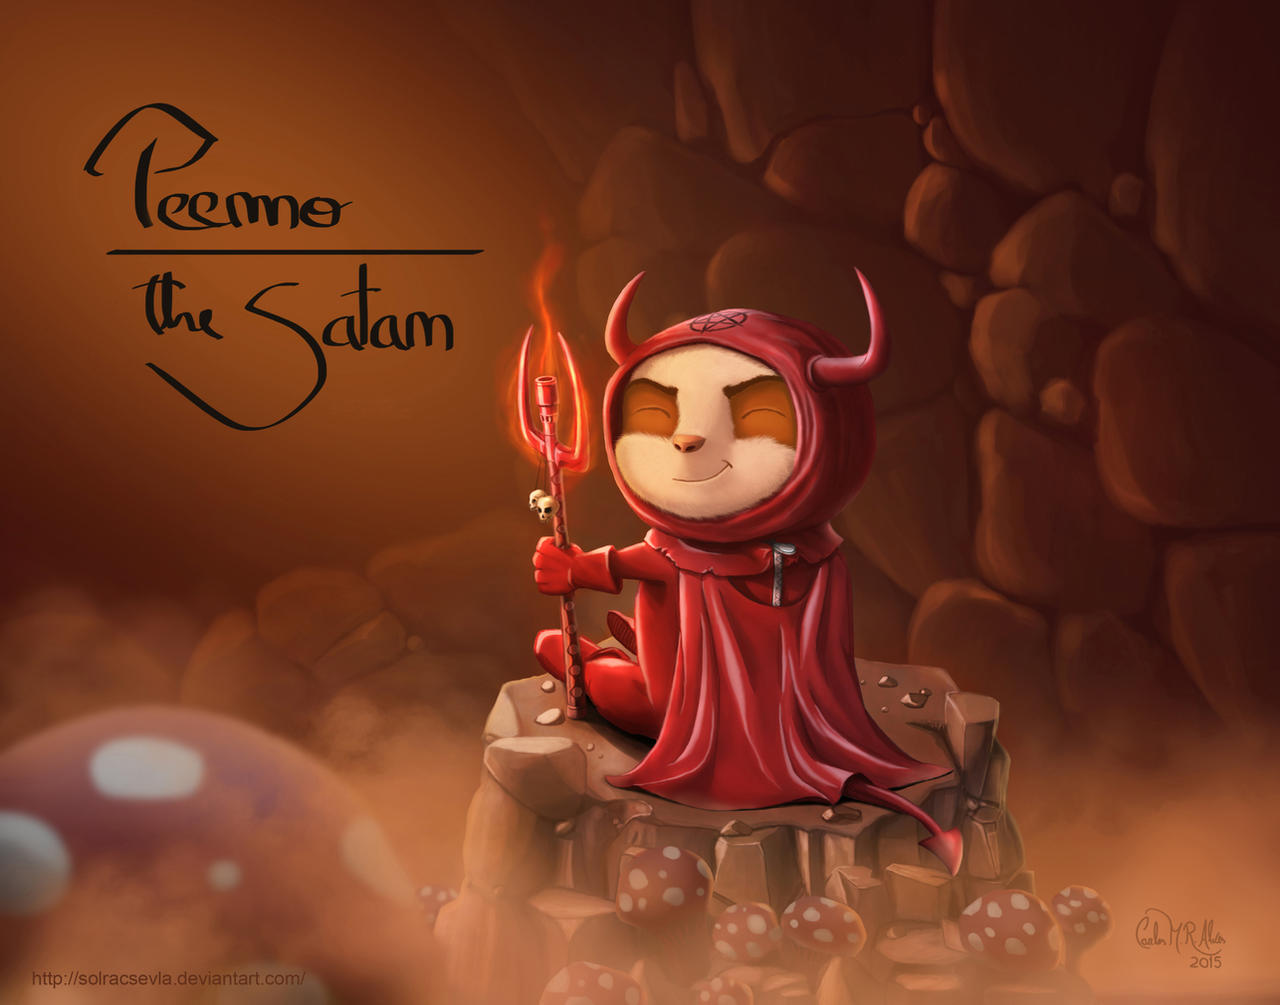 Teemo, the Satan by SolracSevla on DeviantArt